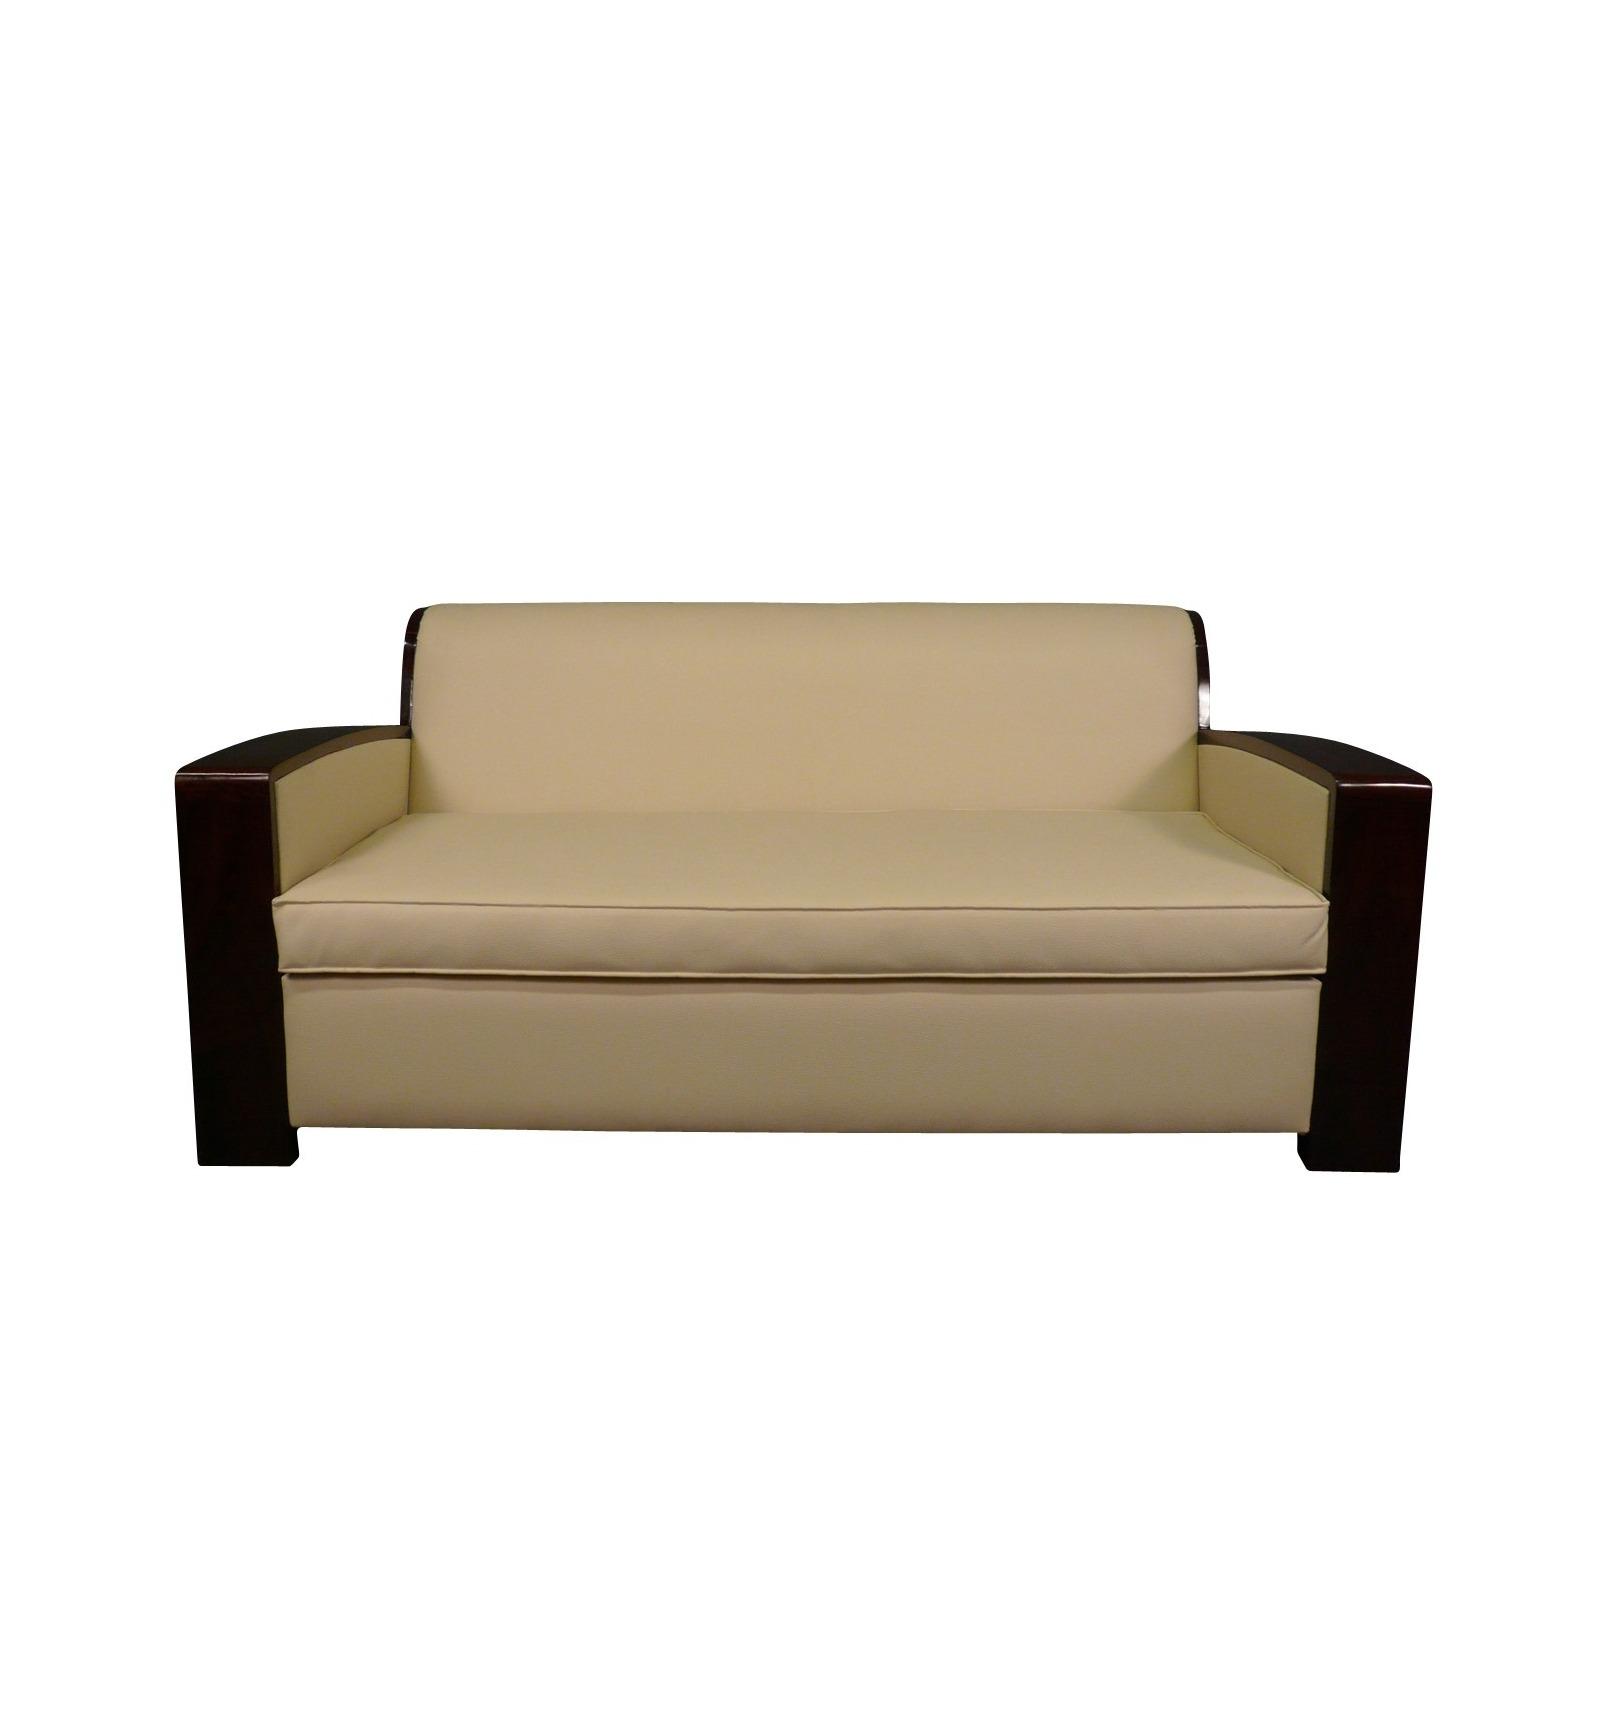 Sofa art deco paris art deco furniture for Art decoration fr